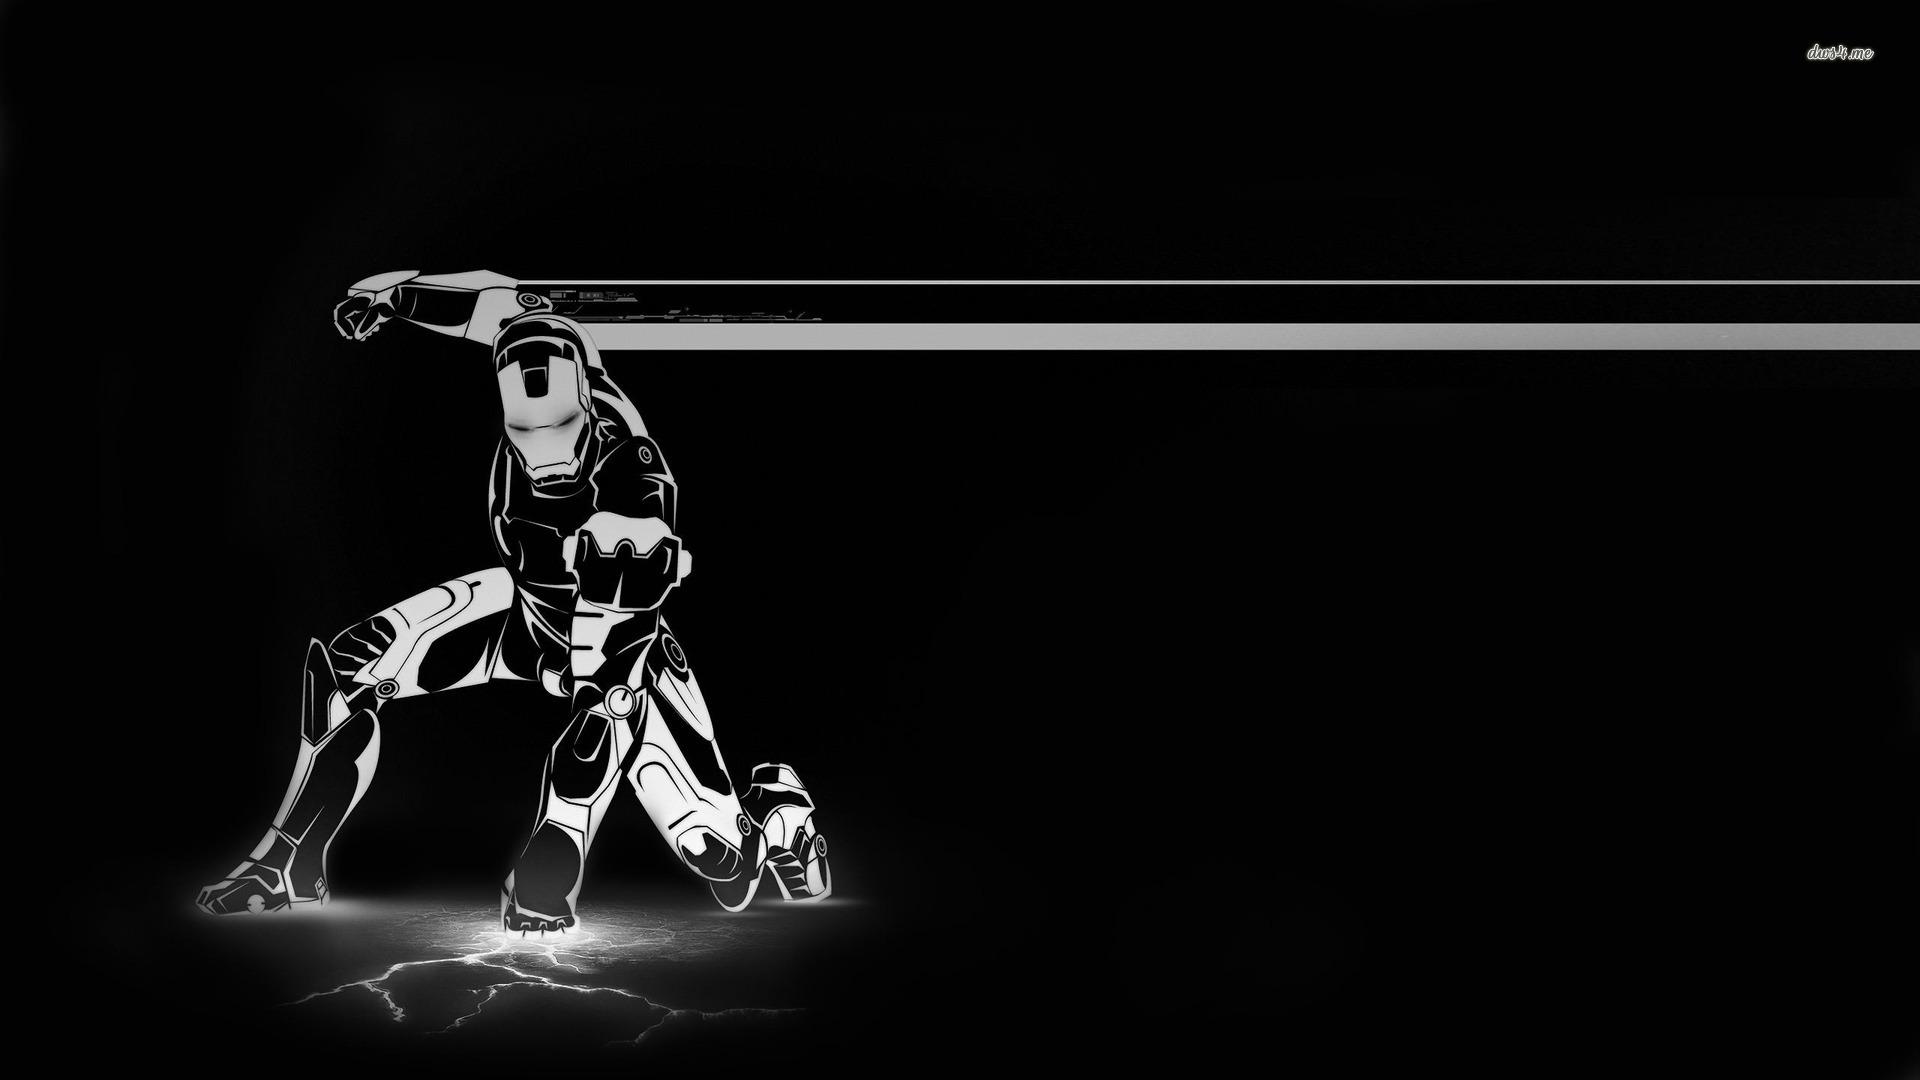 35 Iron Man HD Wallpapers for Desktop   Cartoon District 1920x1080